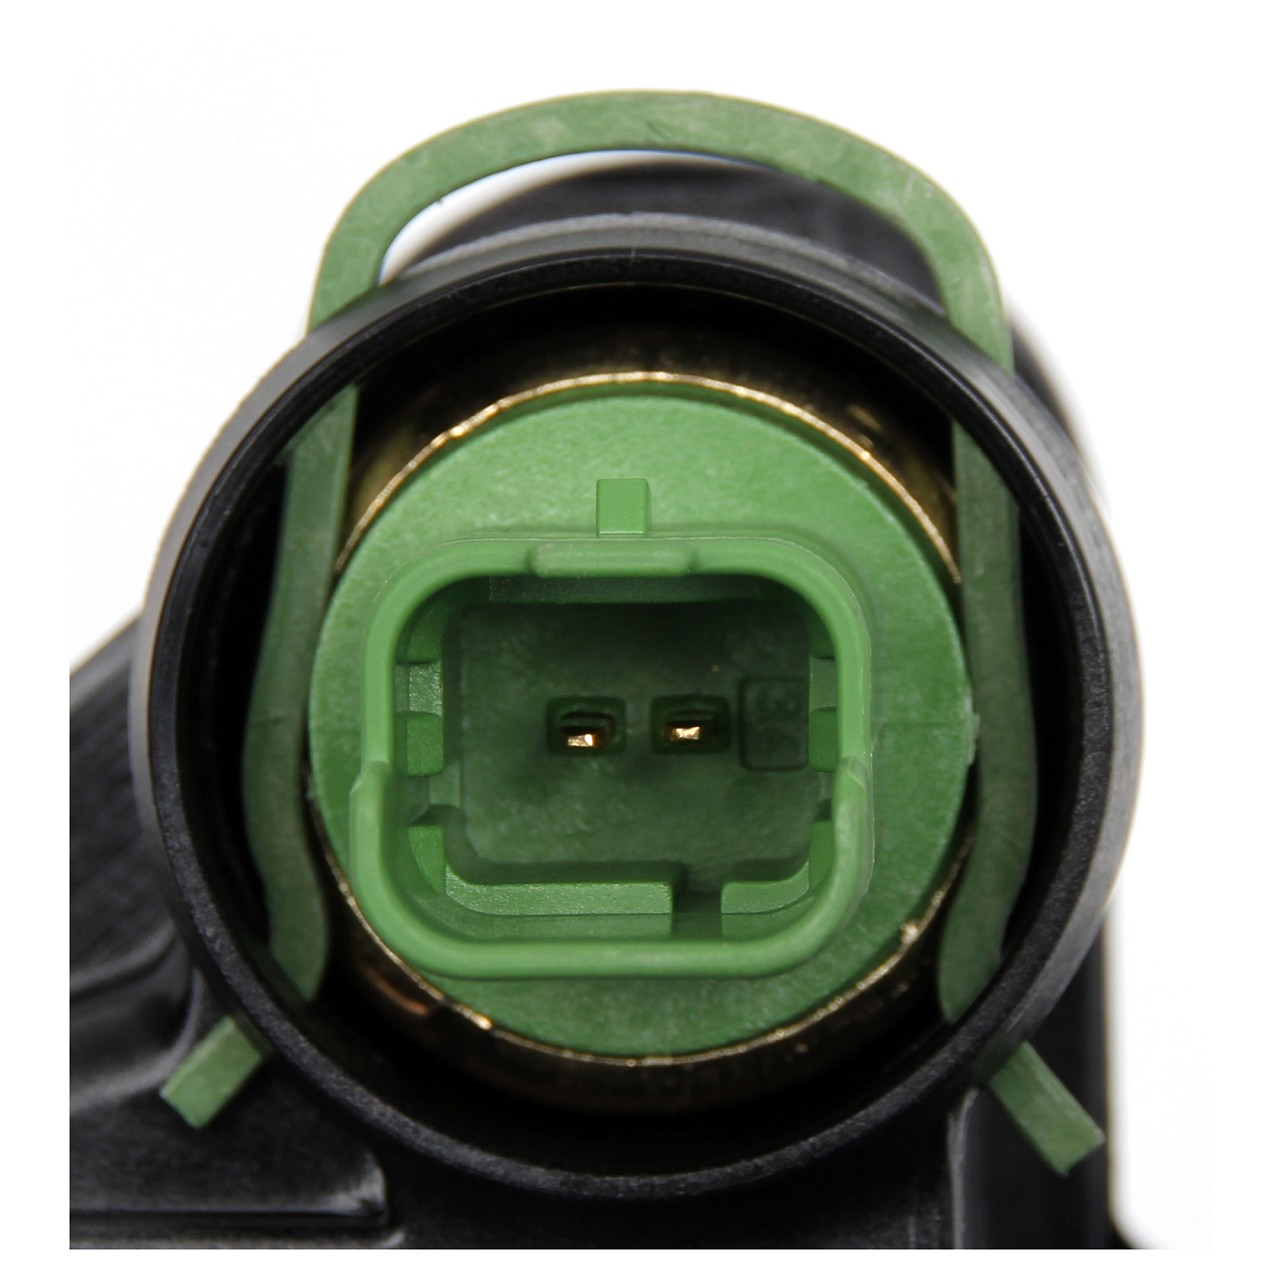 ORIGINAL Citroen Peugeot Thermostat + Thermostatgehäuse + Sensor 1336.AF